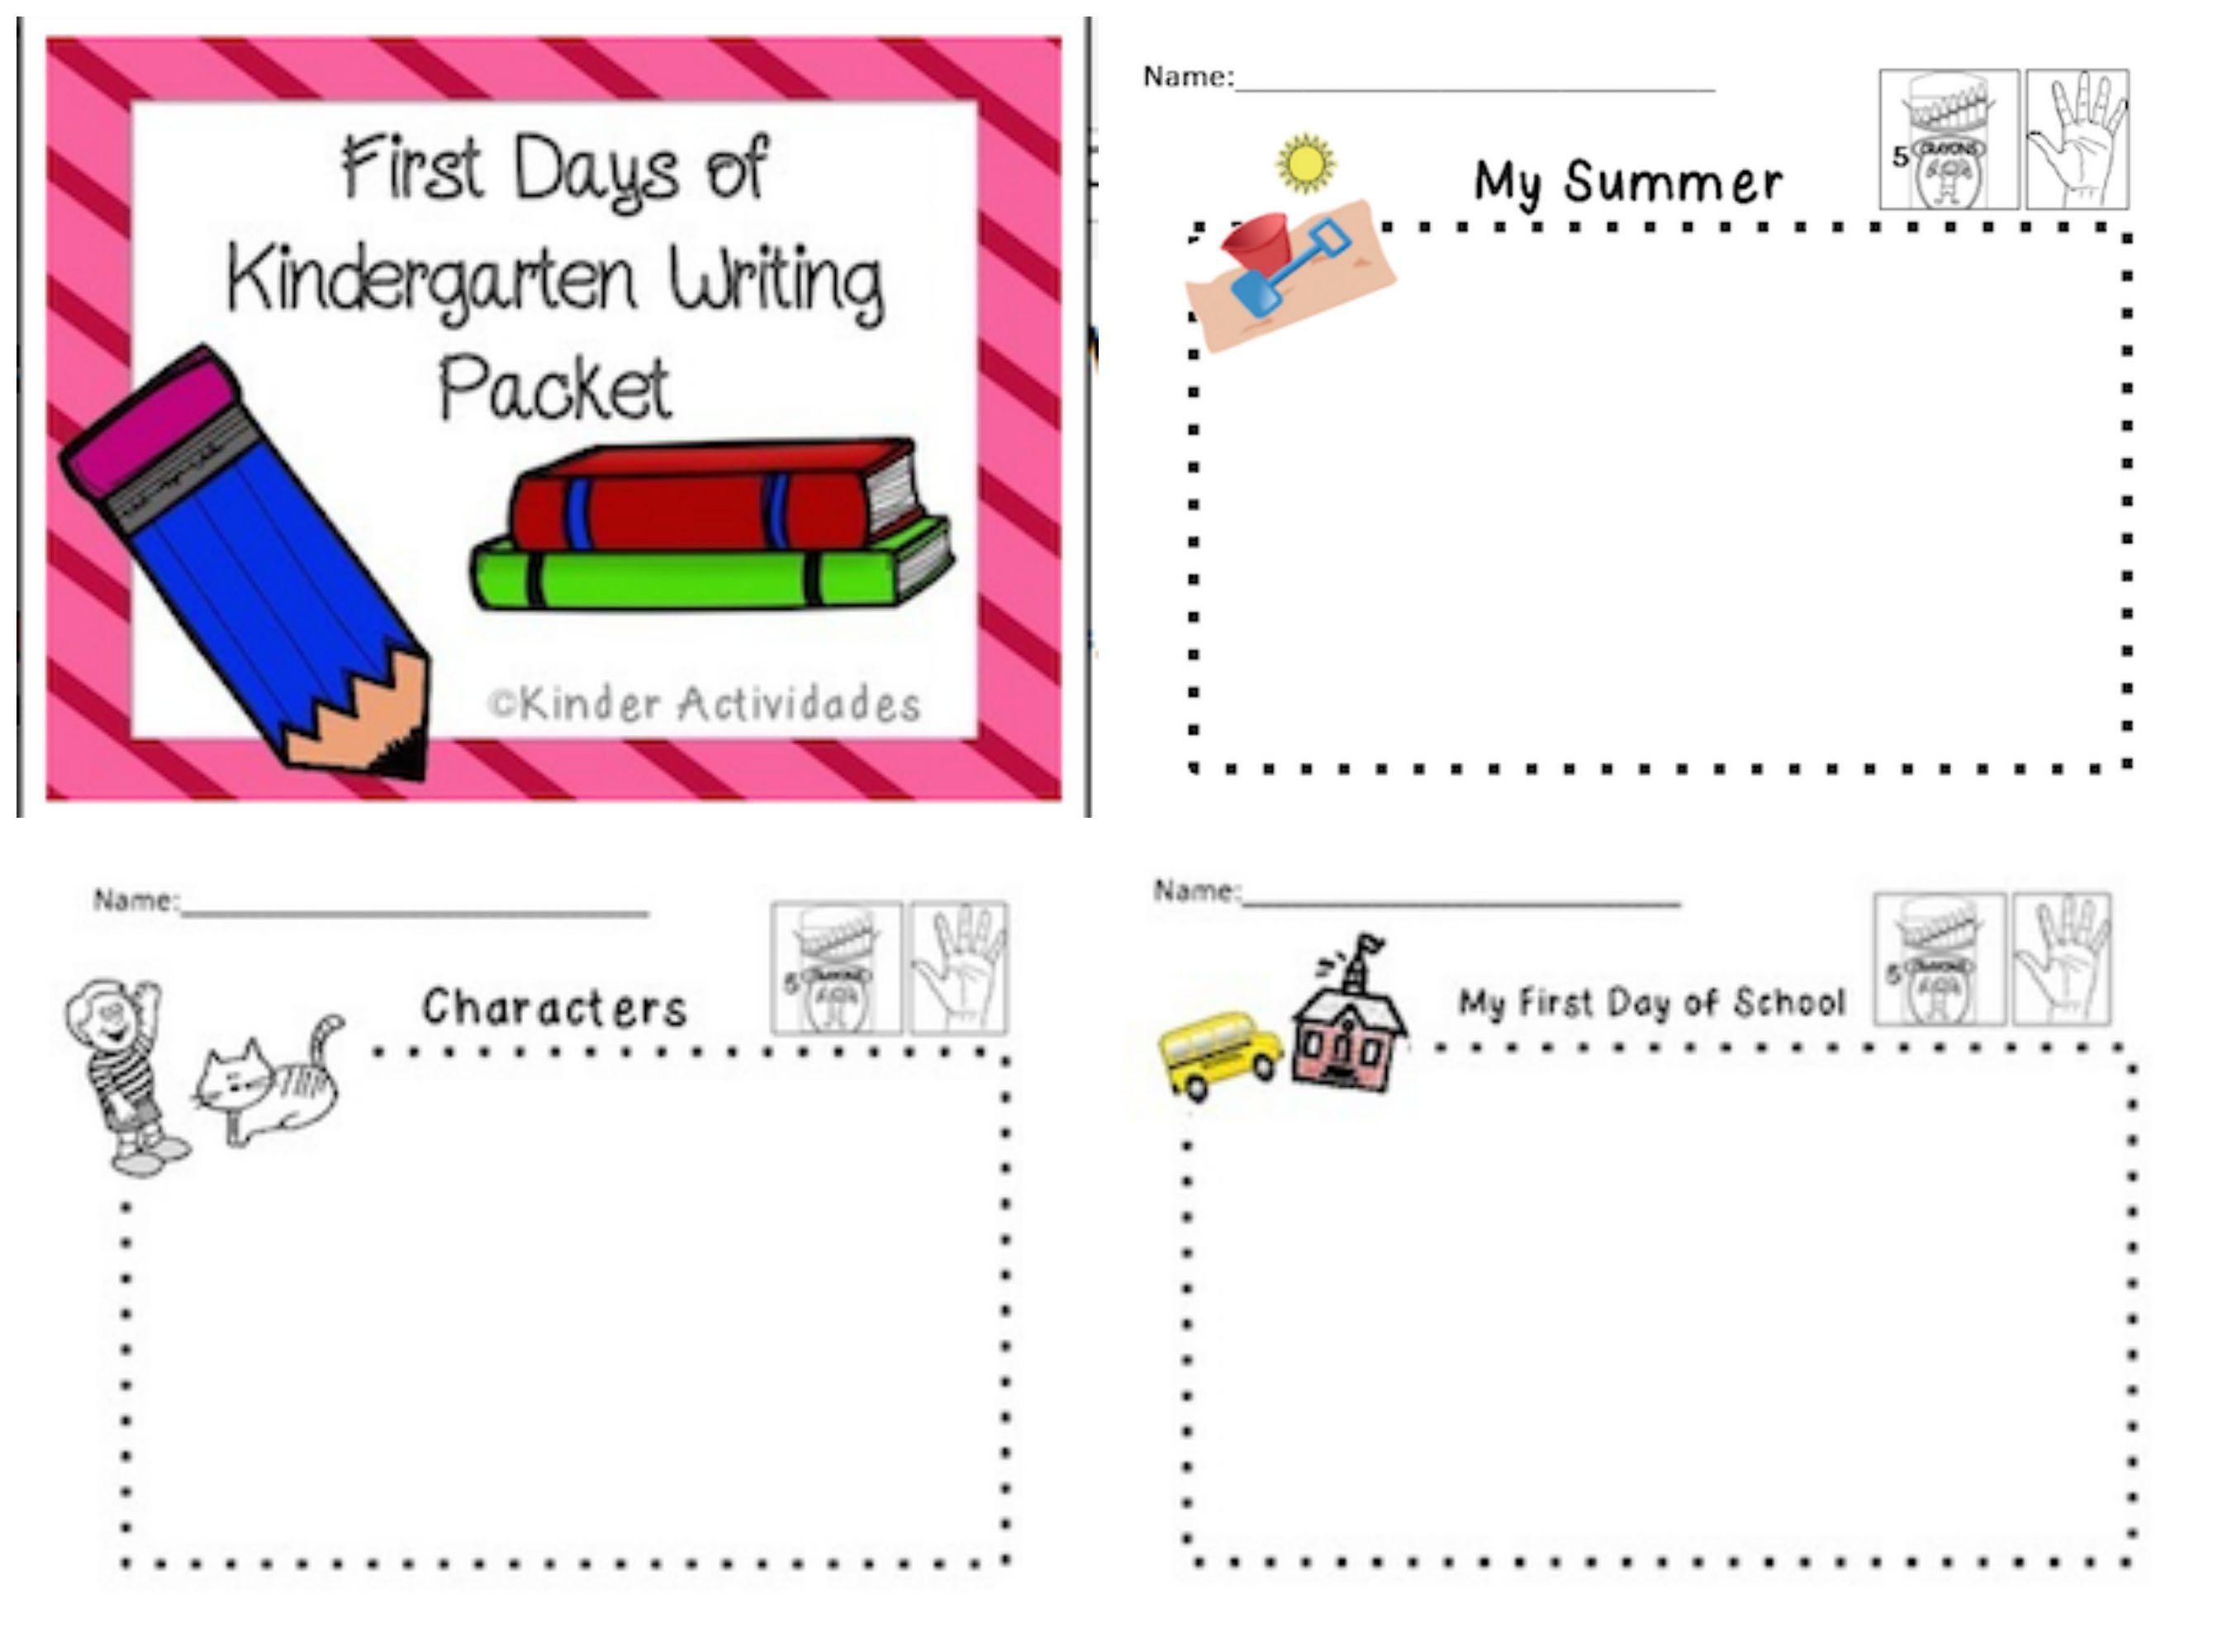 2679x2000 First Days Of Kindergarten Early Writing Packet Kindergarten